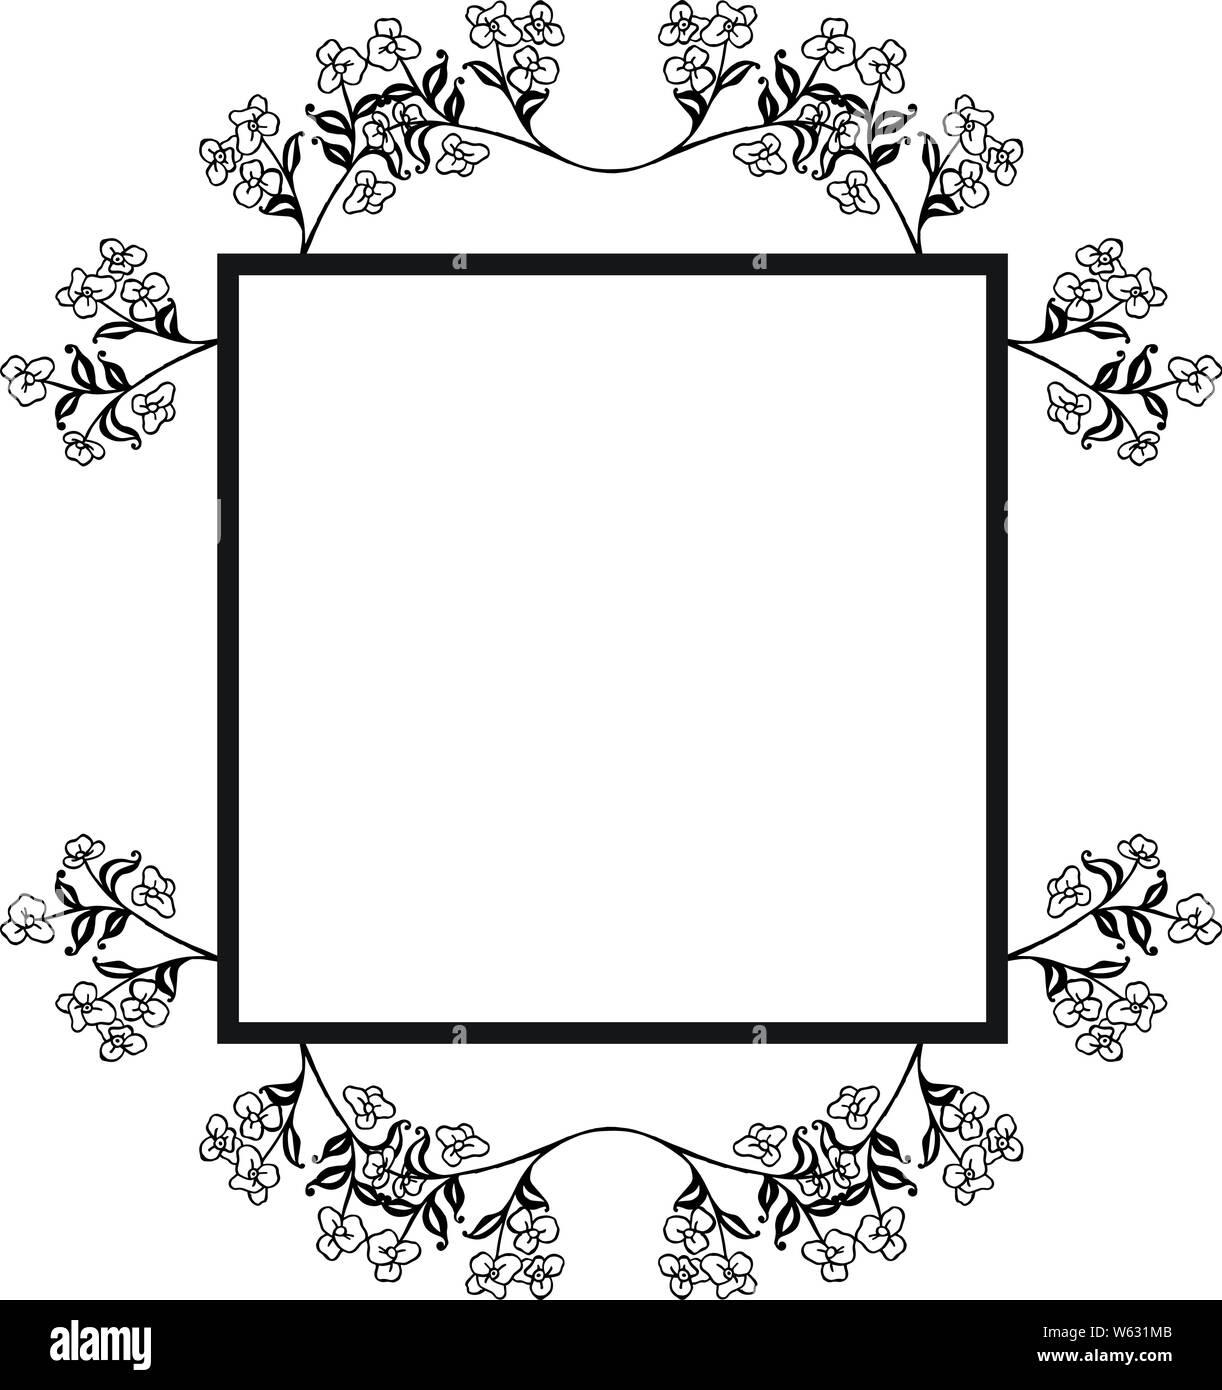 black and white invitation background